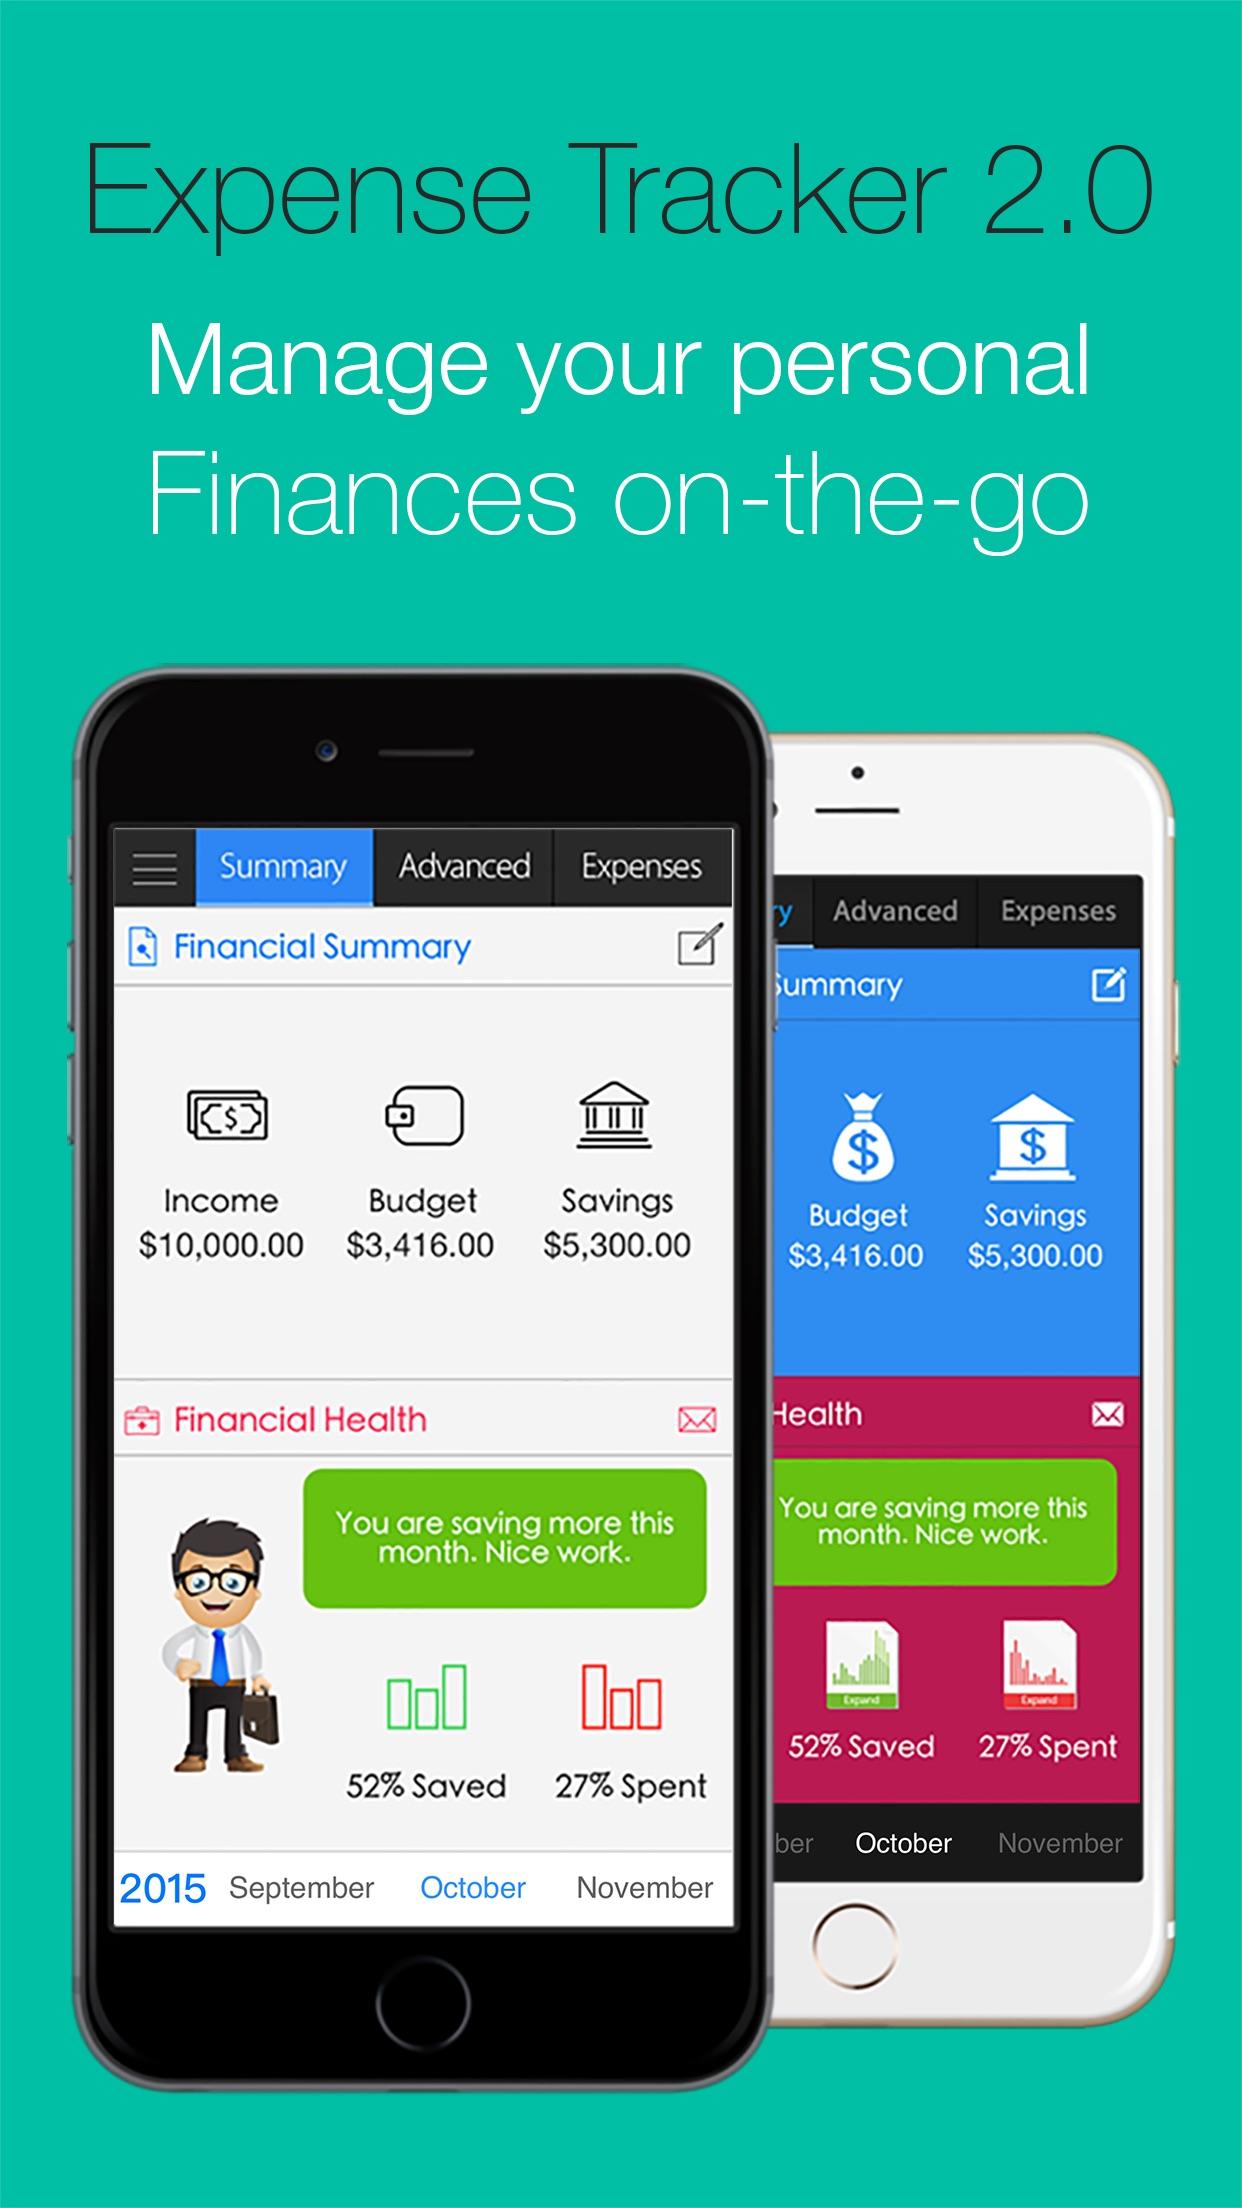 Expense Tracker 2.0 Let's Save Screenshot